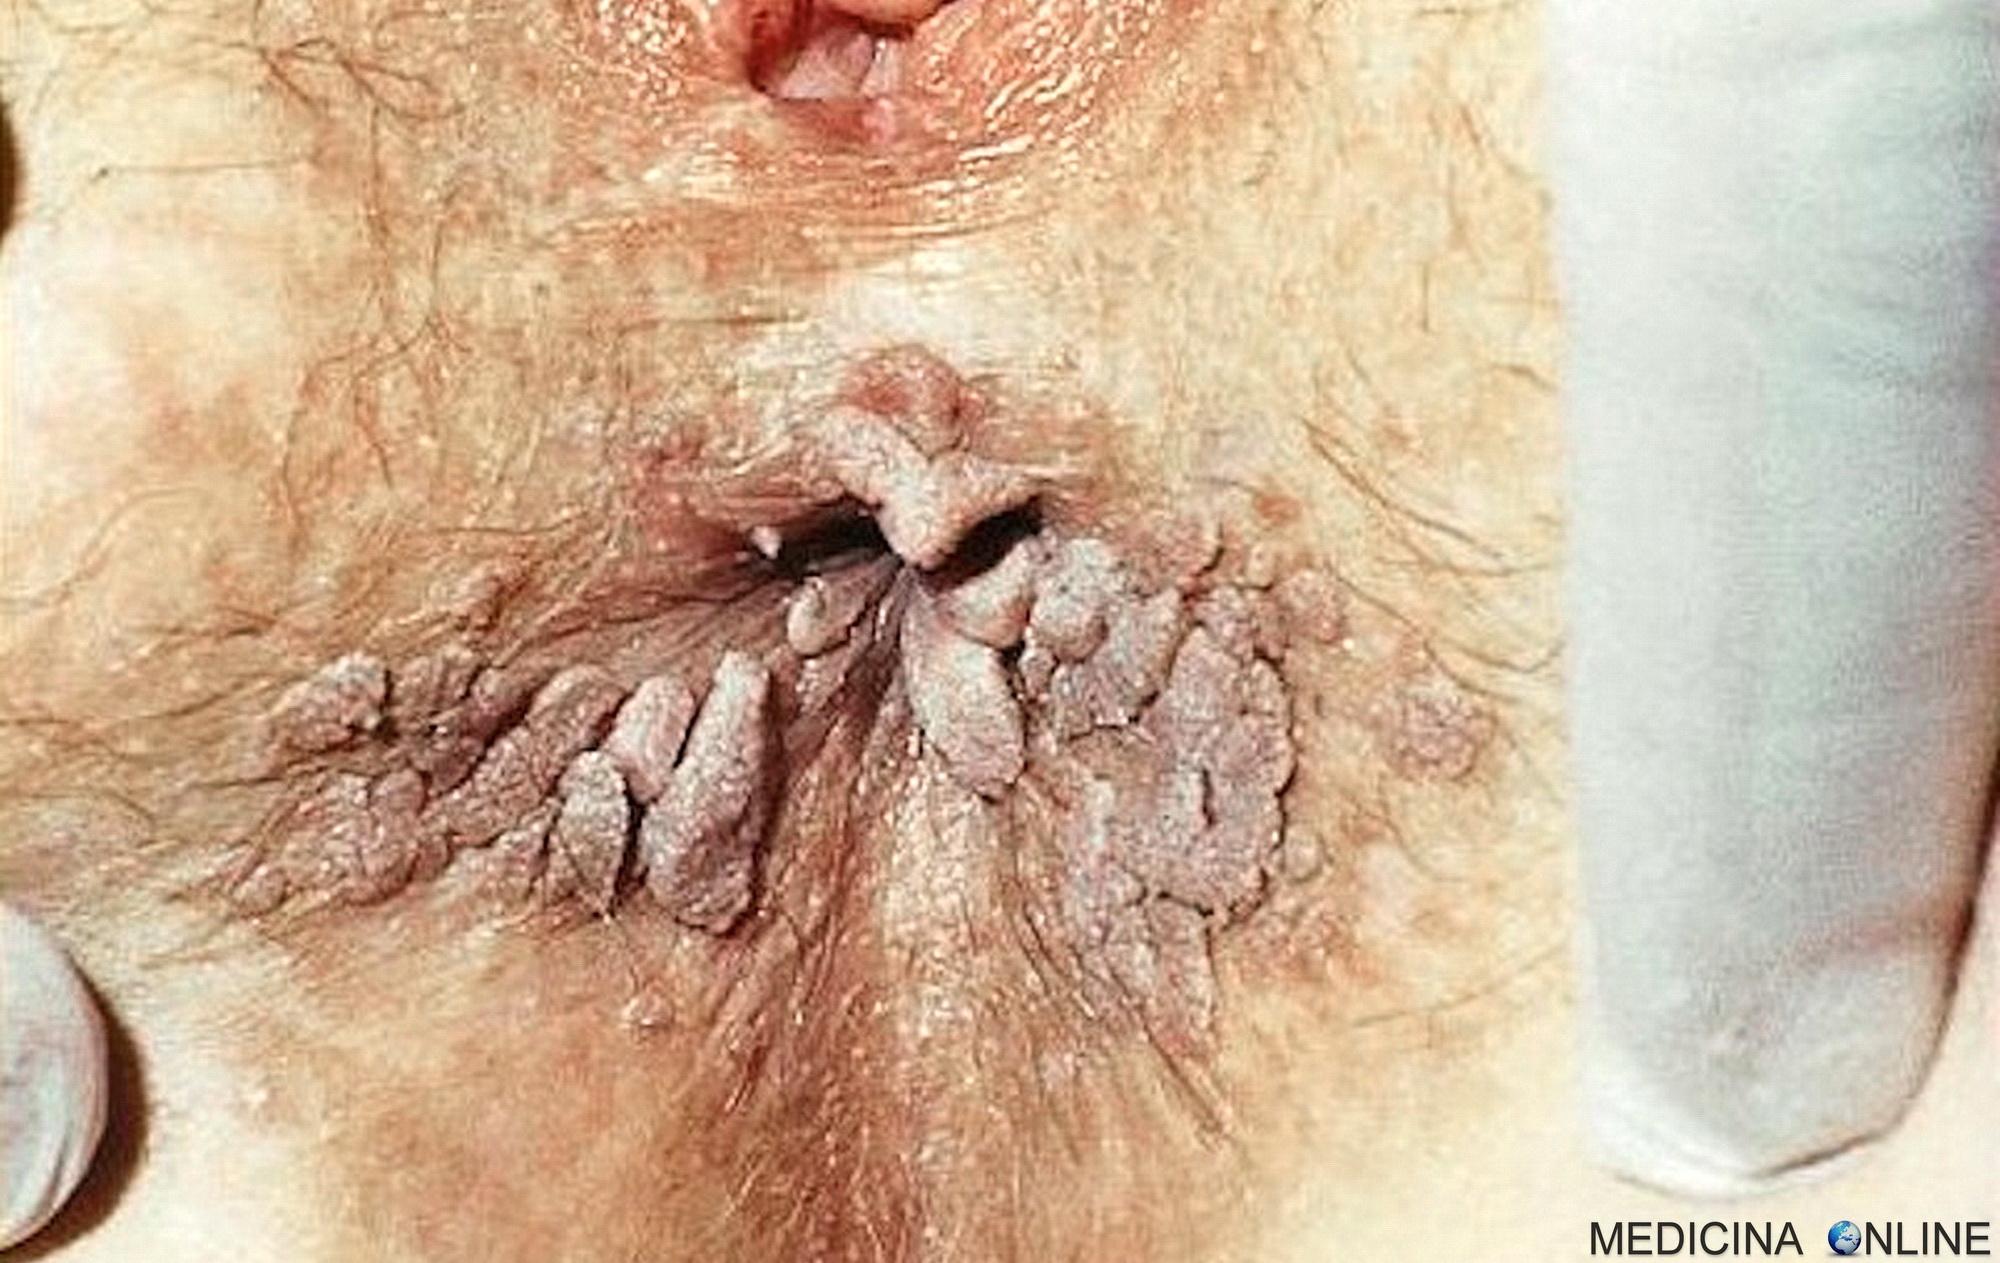 Hpv uomo senza condilomi - MALATTIE A TRASMISSIONE SESSUALE (MTS) BOLI CU TRANSMITERE SEXUALA(STD)